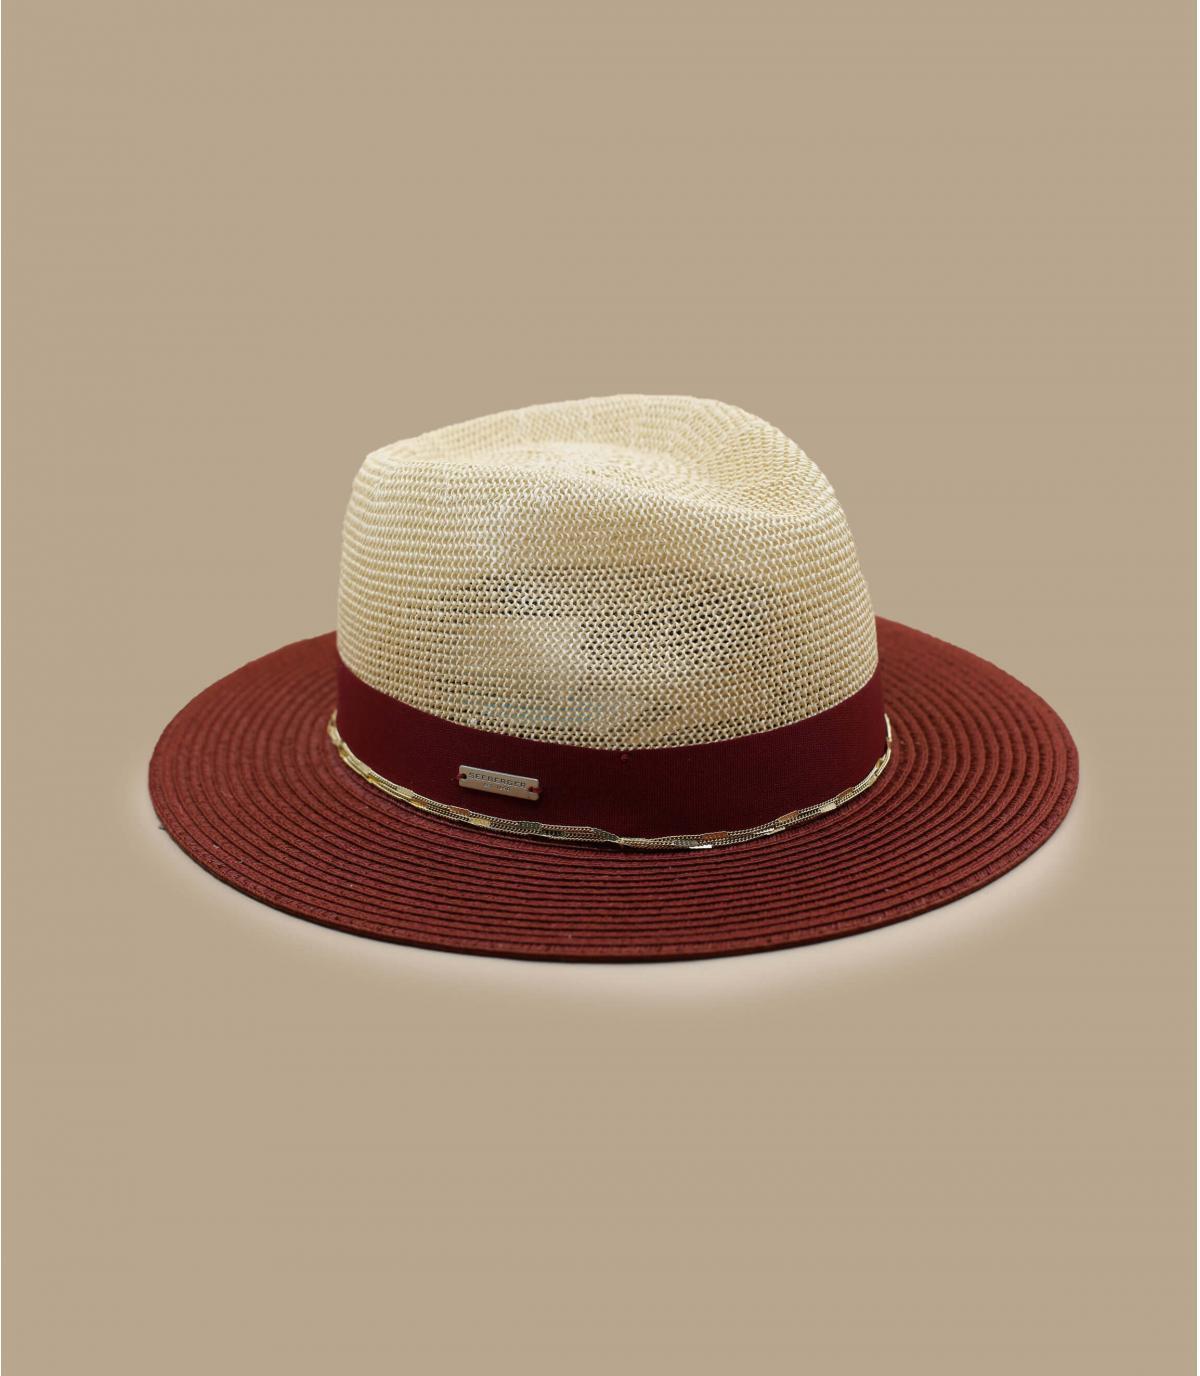 strooien hoed met gouden ketting